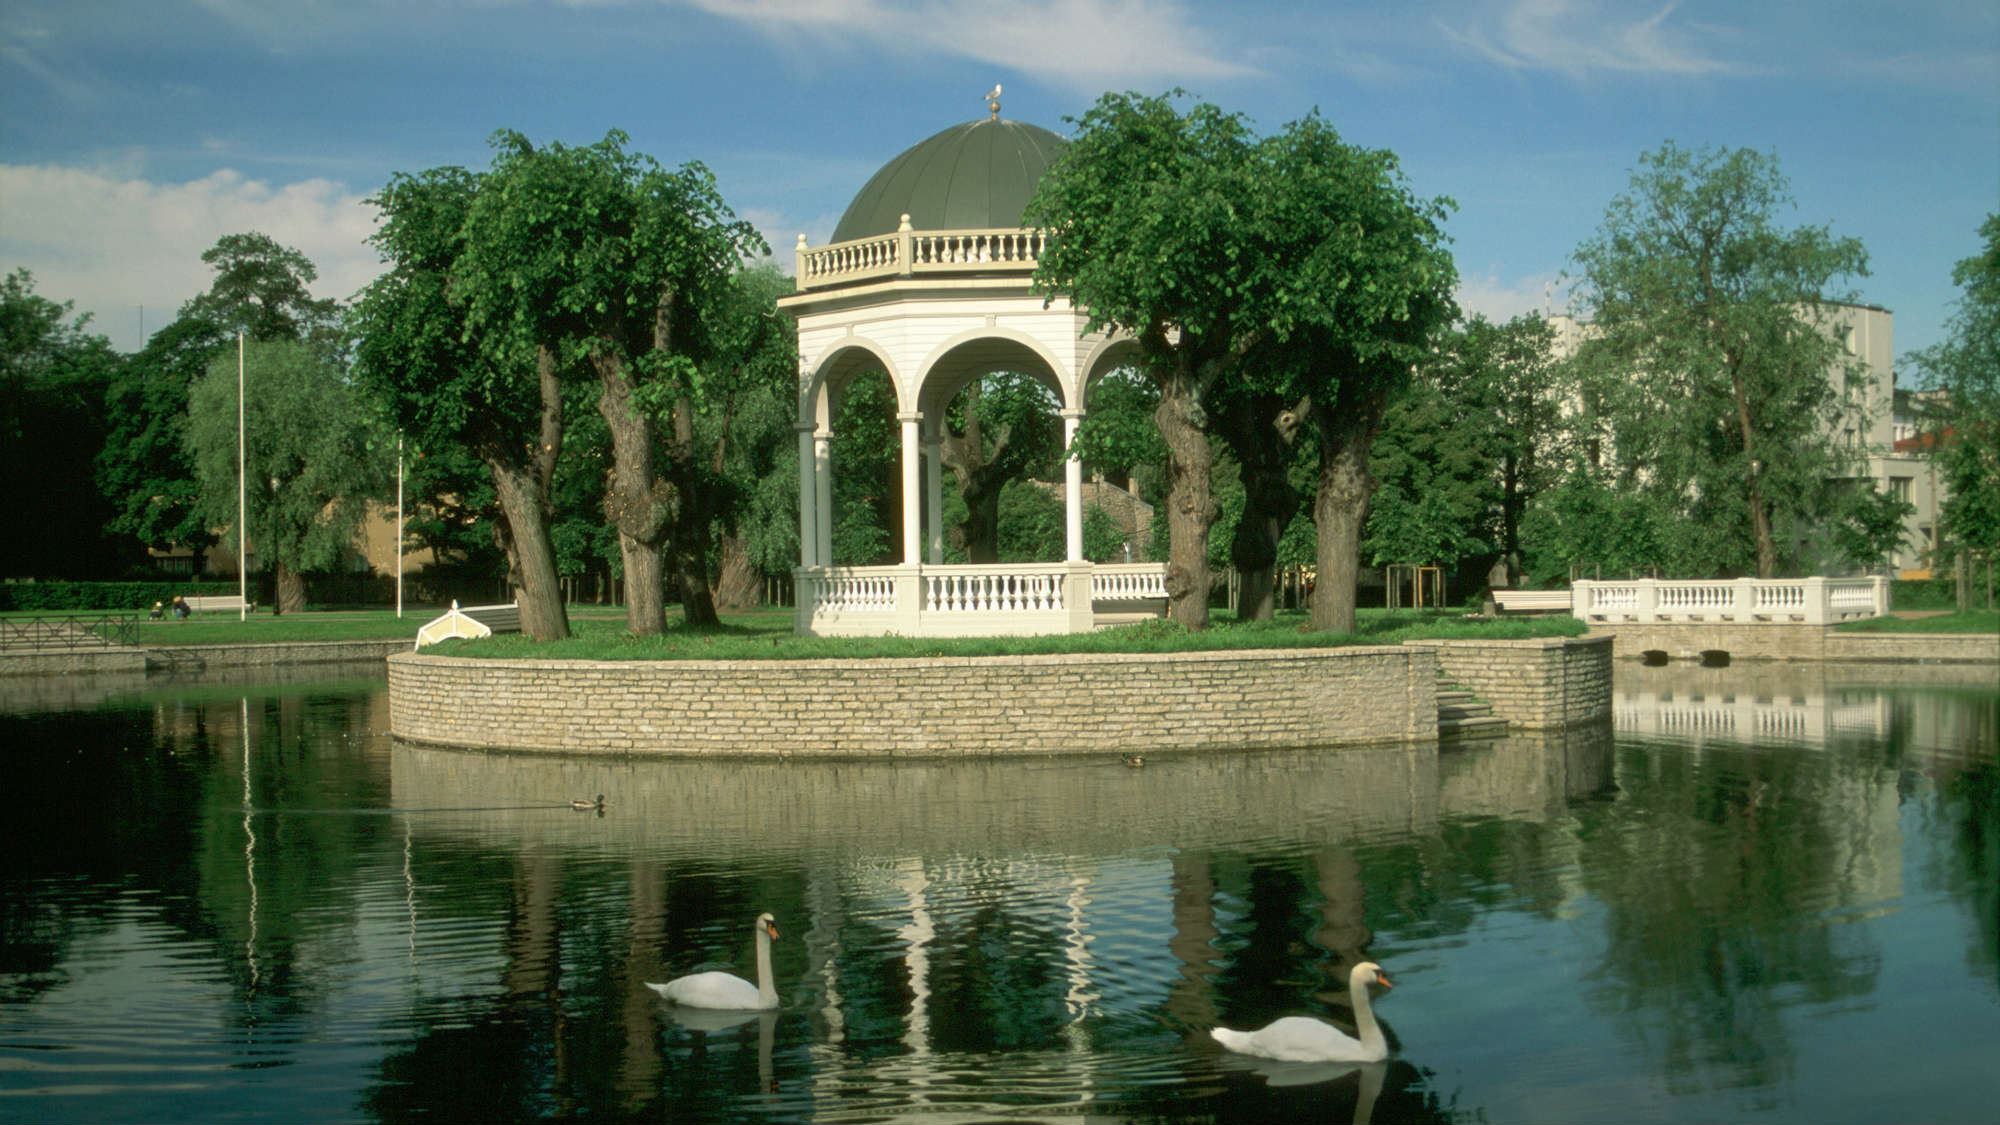 Kadriorg Park, Tallinn, Estonia. Picture by Ain Avik